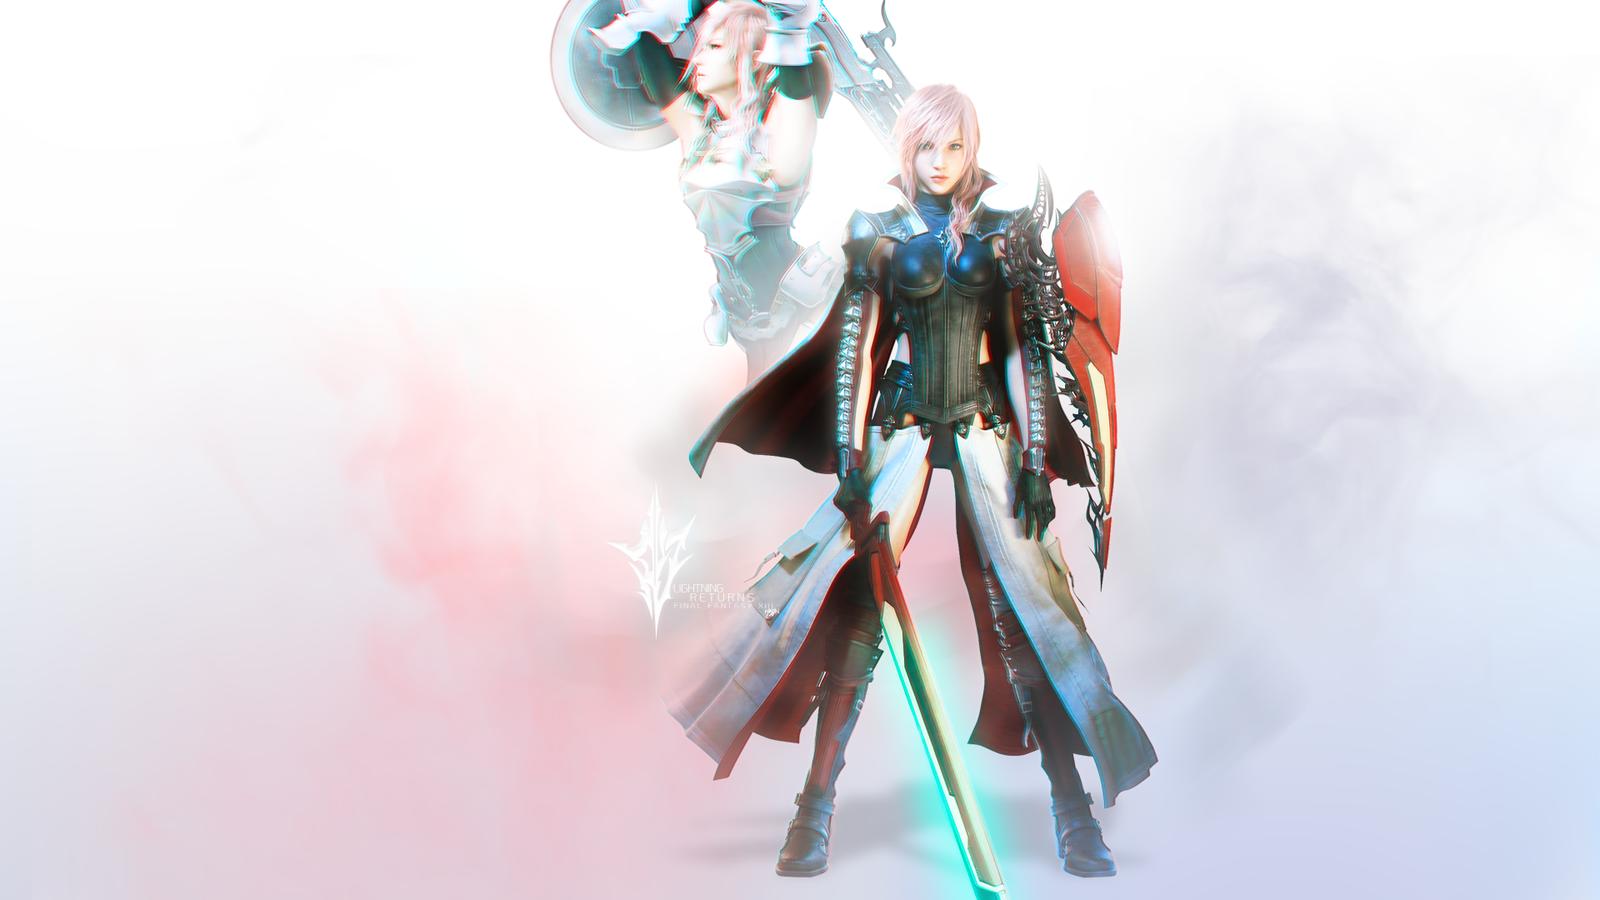 Lightning Returns   FFXIII Wallpaper by MikoyaNx 1600x900